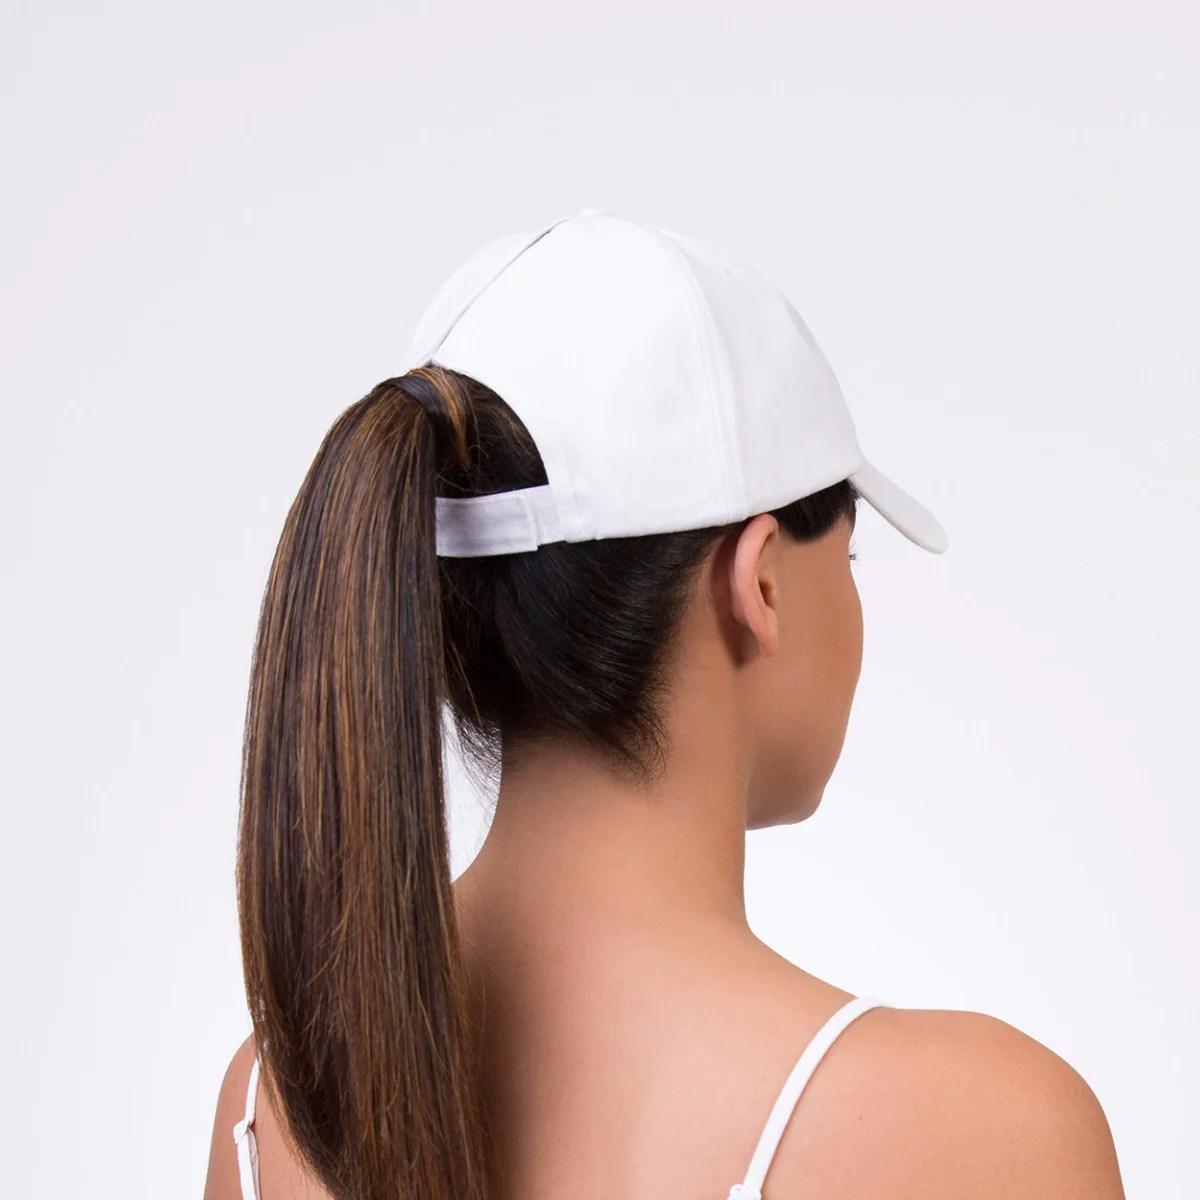 spony ponytail baseball cap - softball